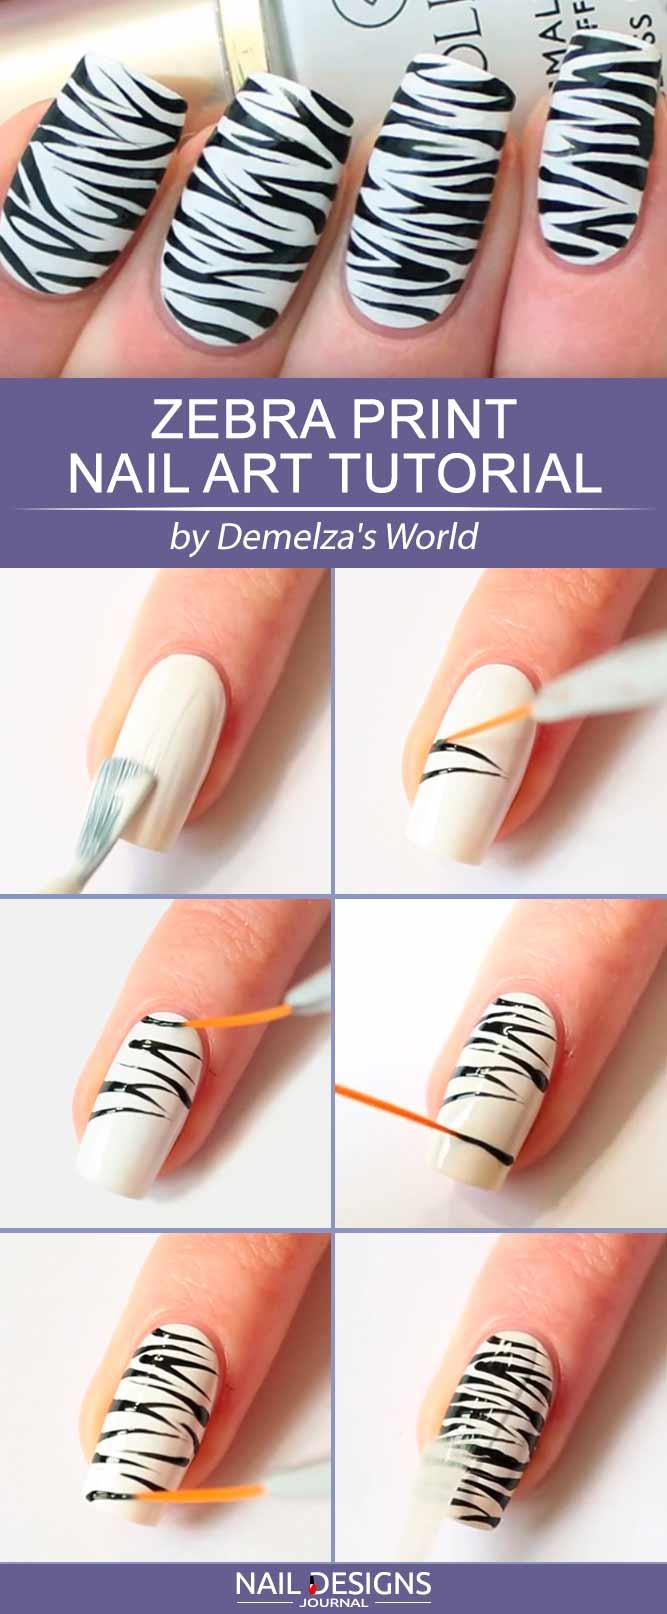 Step By Step Tutorial How To Paint Zebra Print On Your Nails #blackandwhitenails #stripesnails #squarenails #nailtutorial #diynails